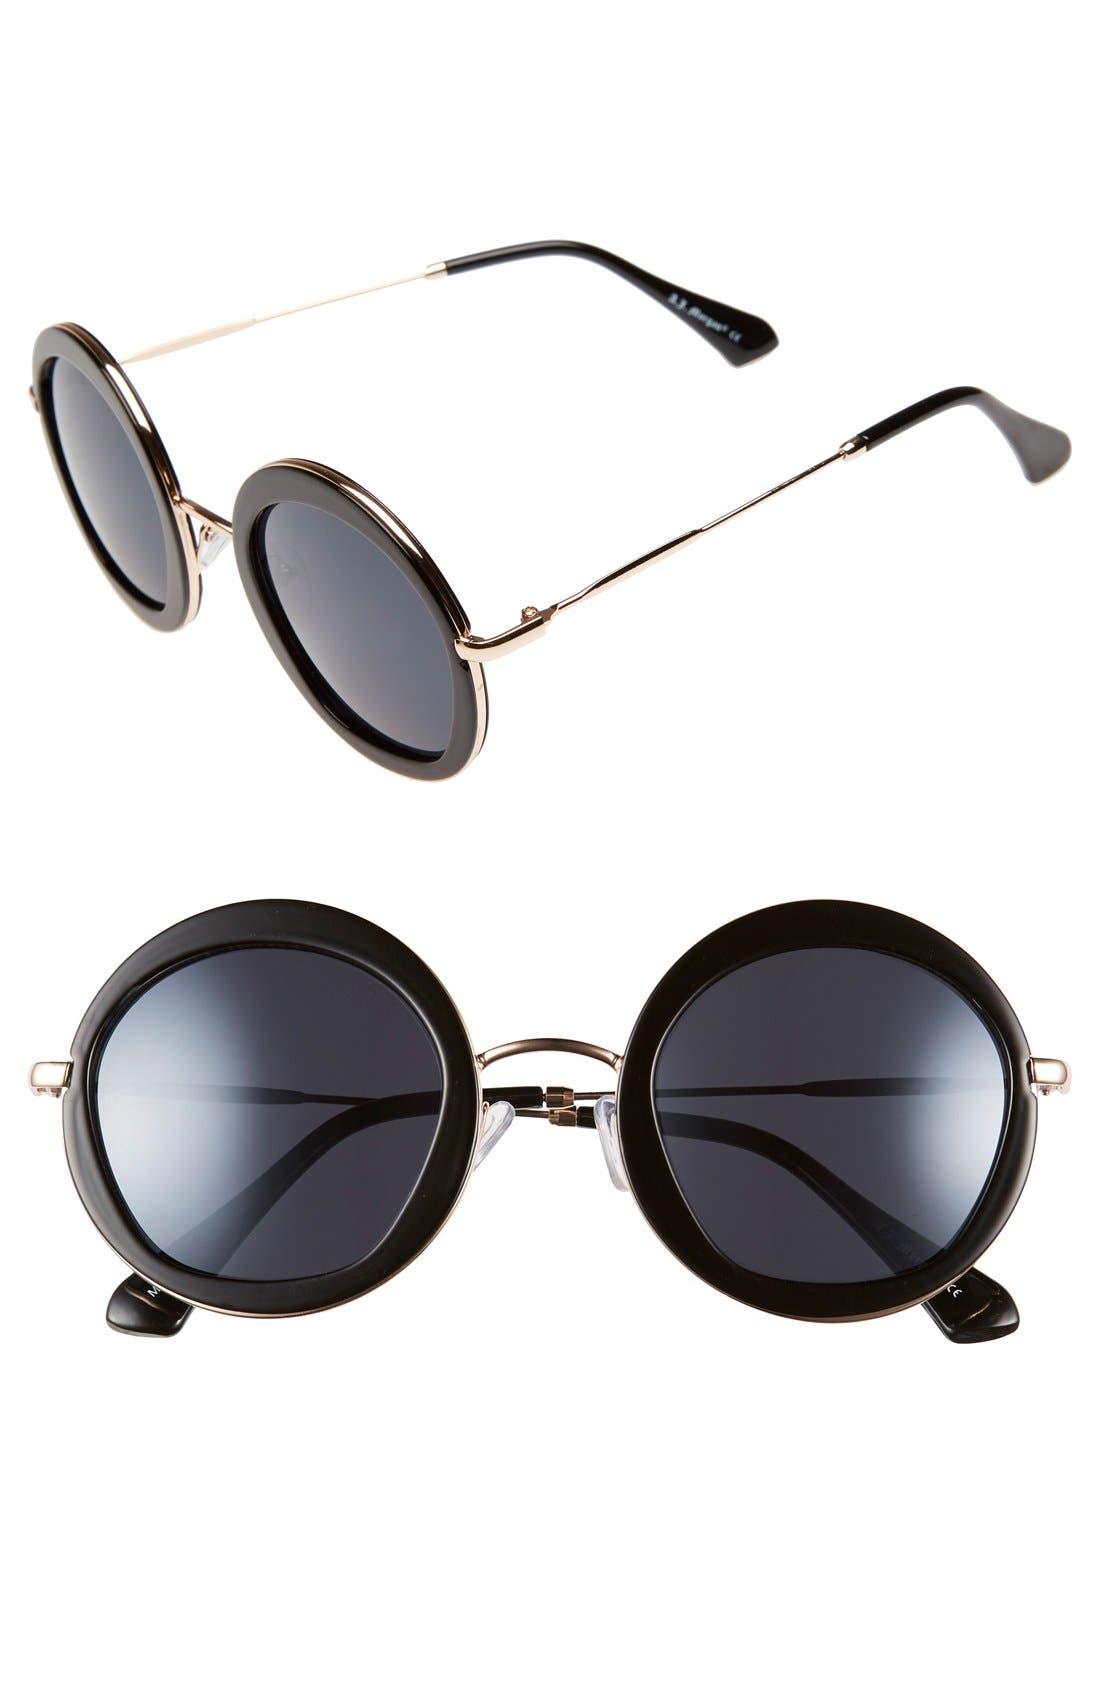 Alternate Image 1 Selected - A.J. Morgan 'Clique' 50mm Round Sunglasses